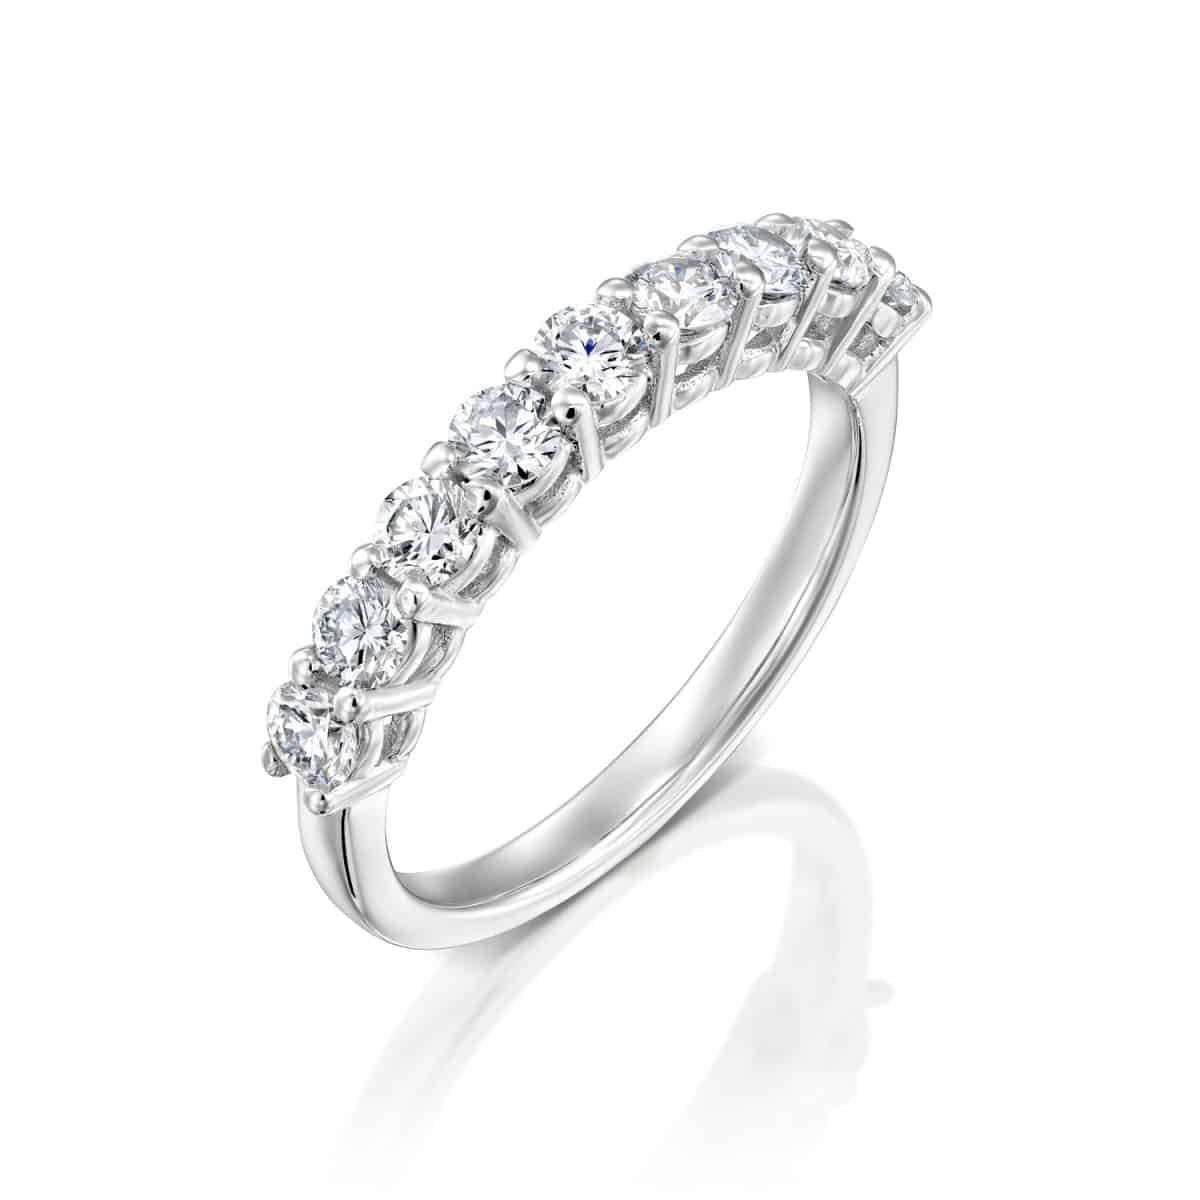 Inlay Lab Grown Diamond Engagement Ring 0.85ct. - main